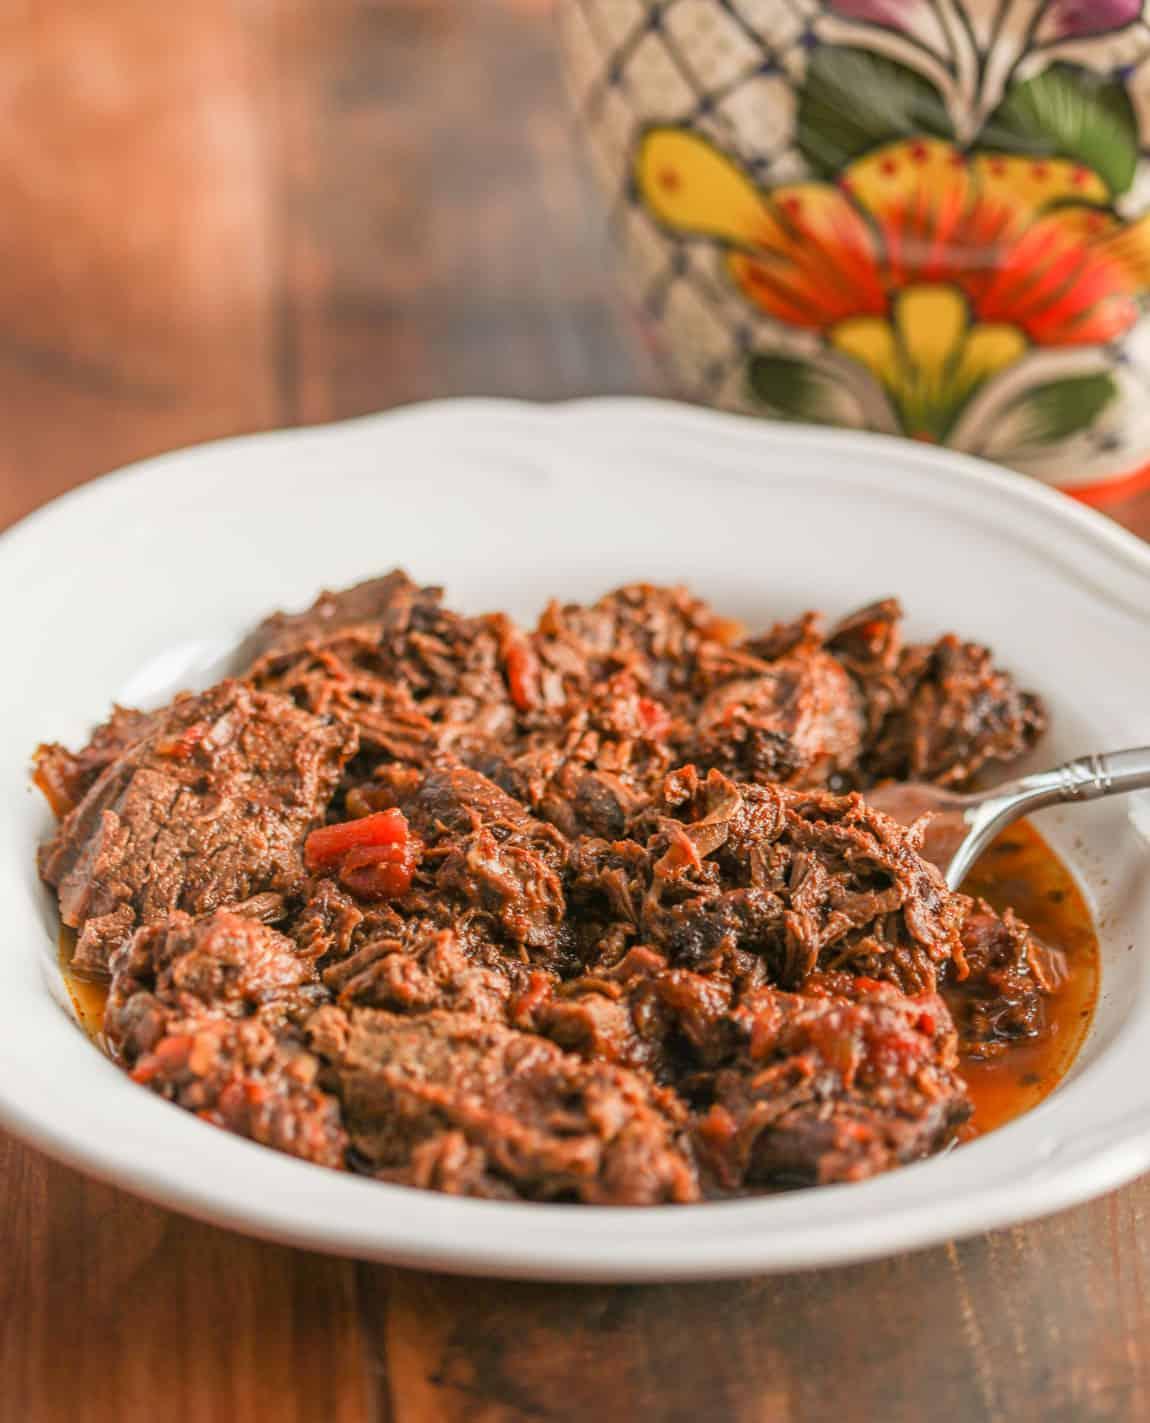 birria de res taco made with bison